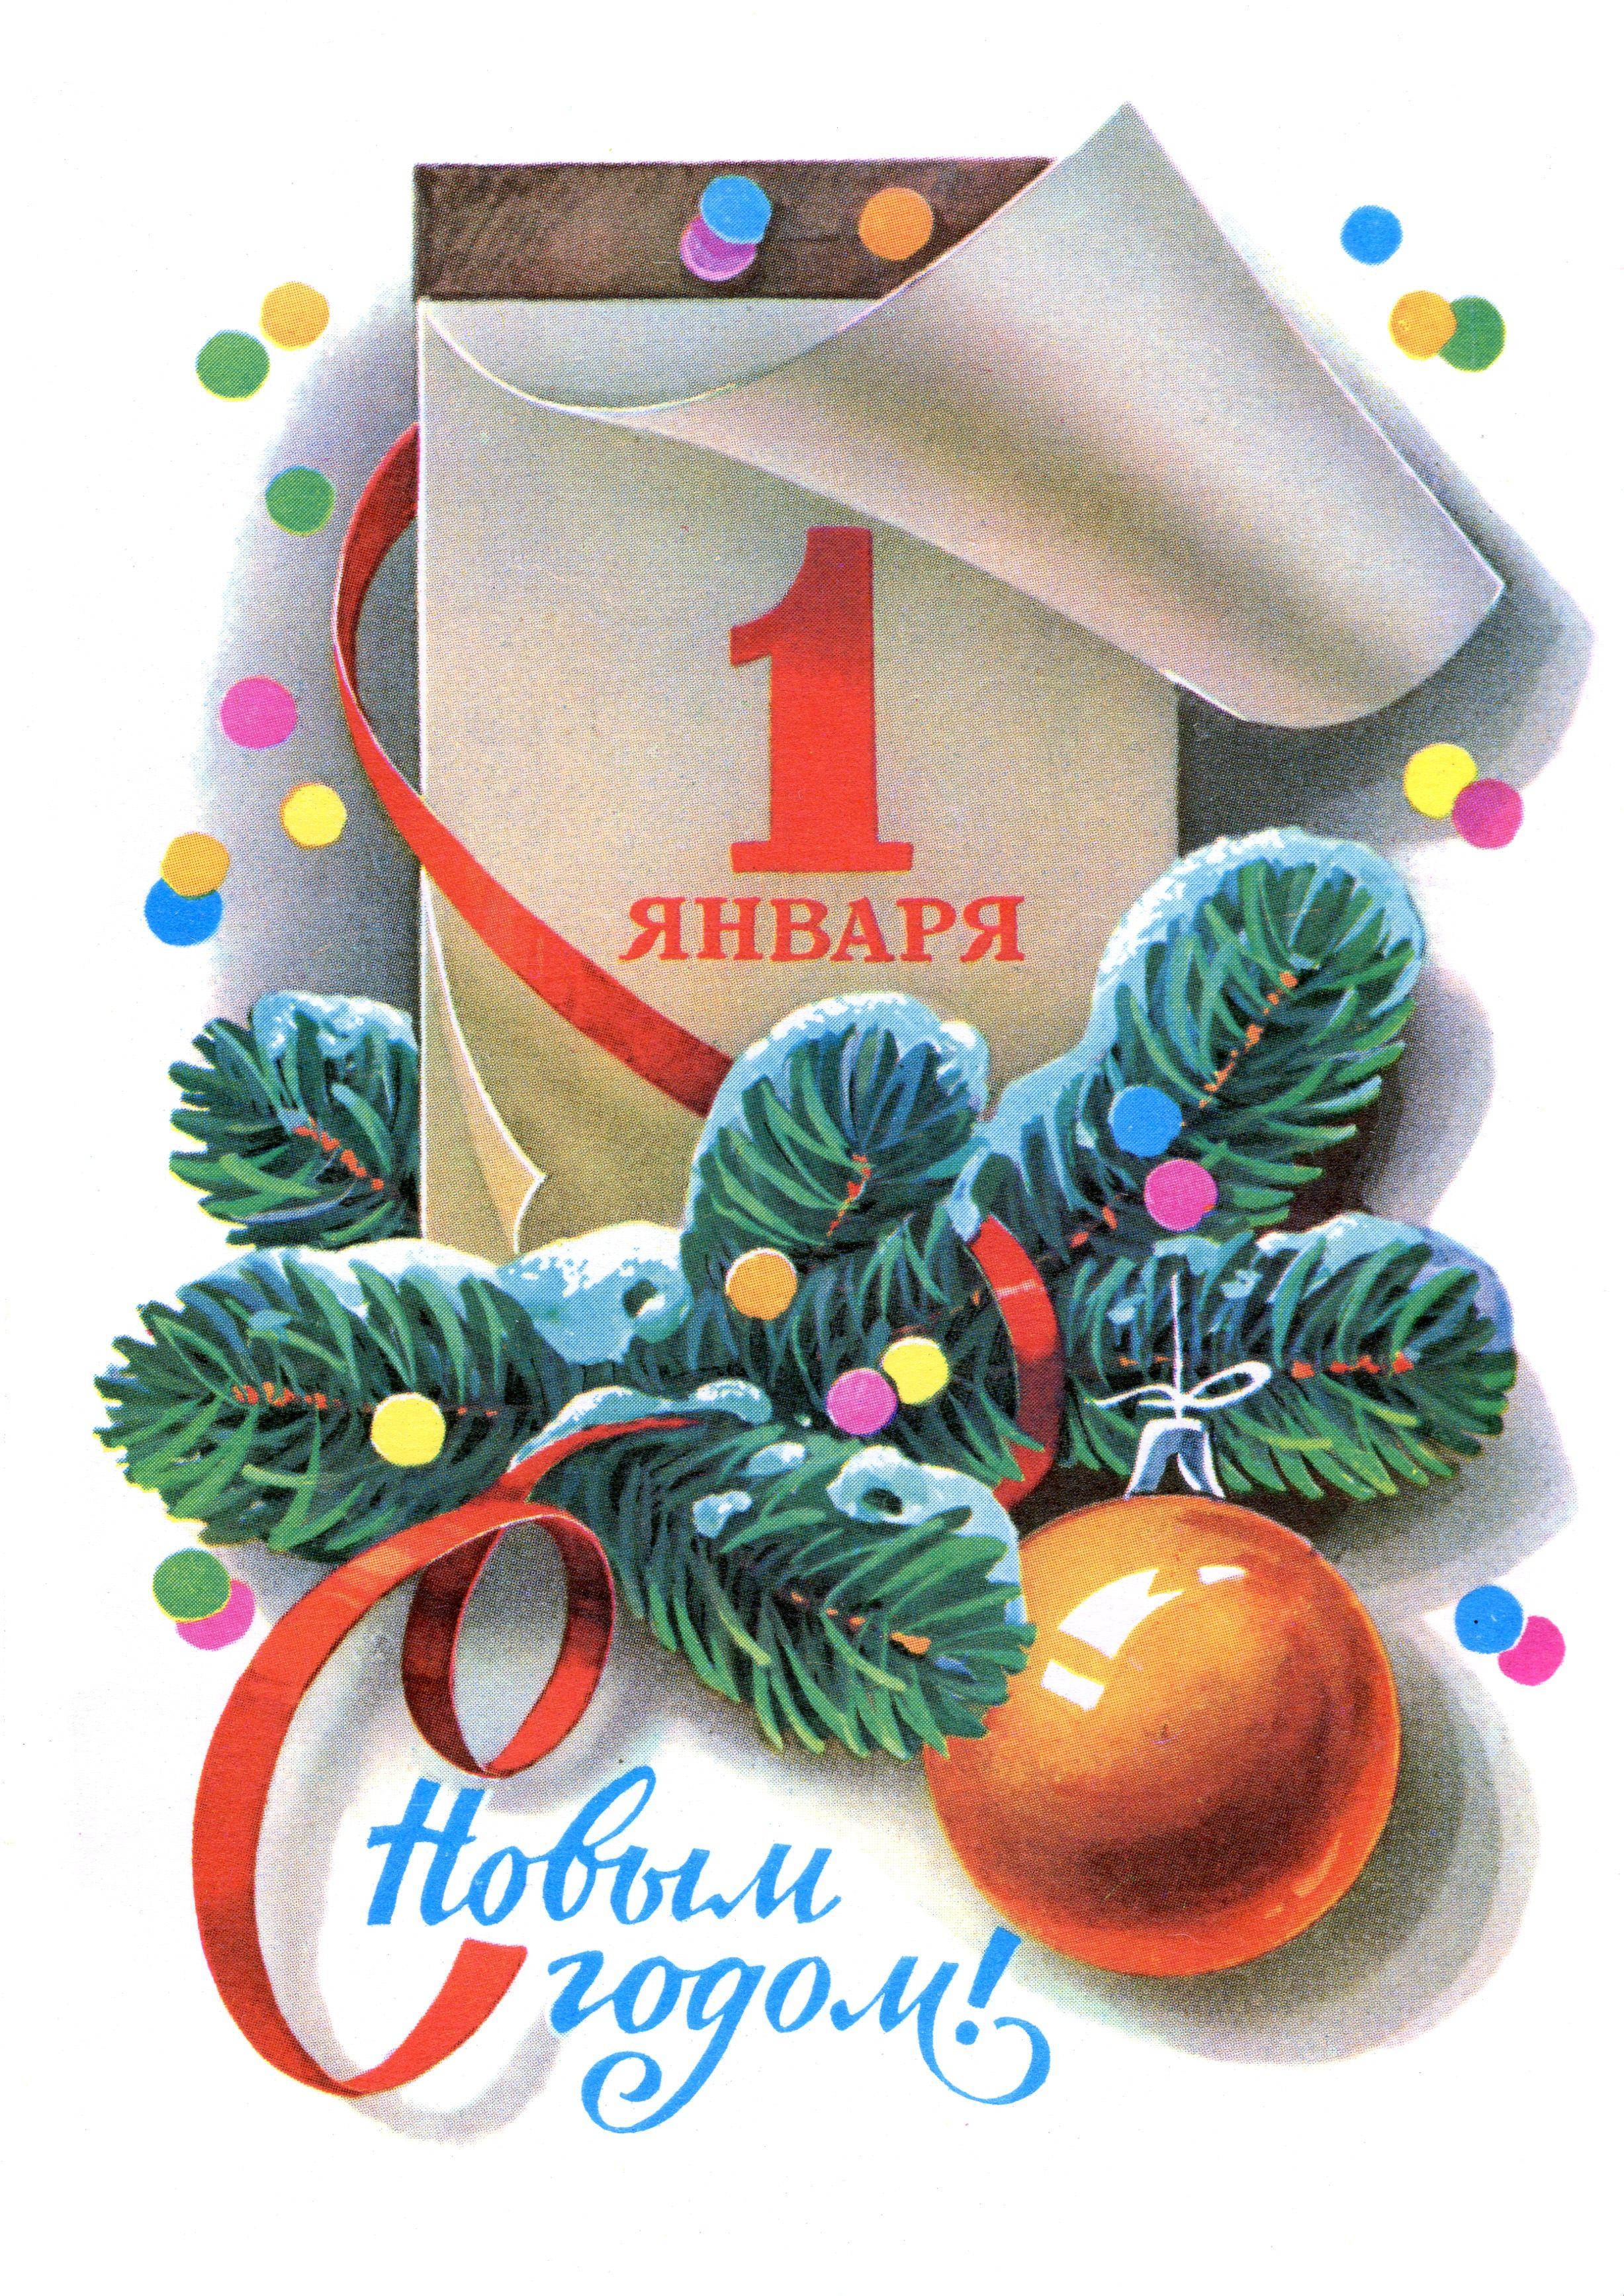 Pin By Svetlana Sentsova On Russian Christmas And New Year Pinterest